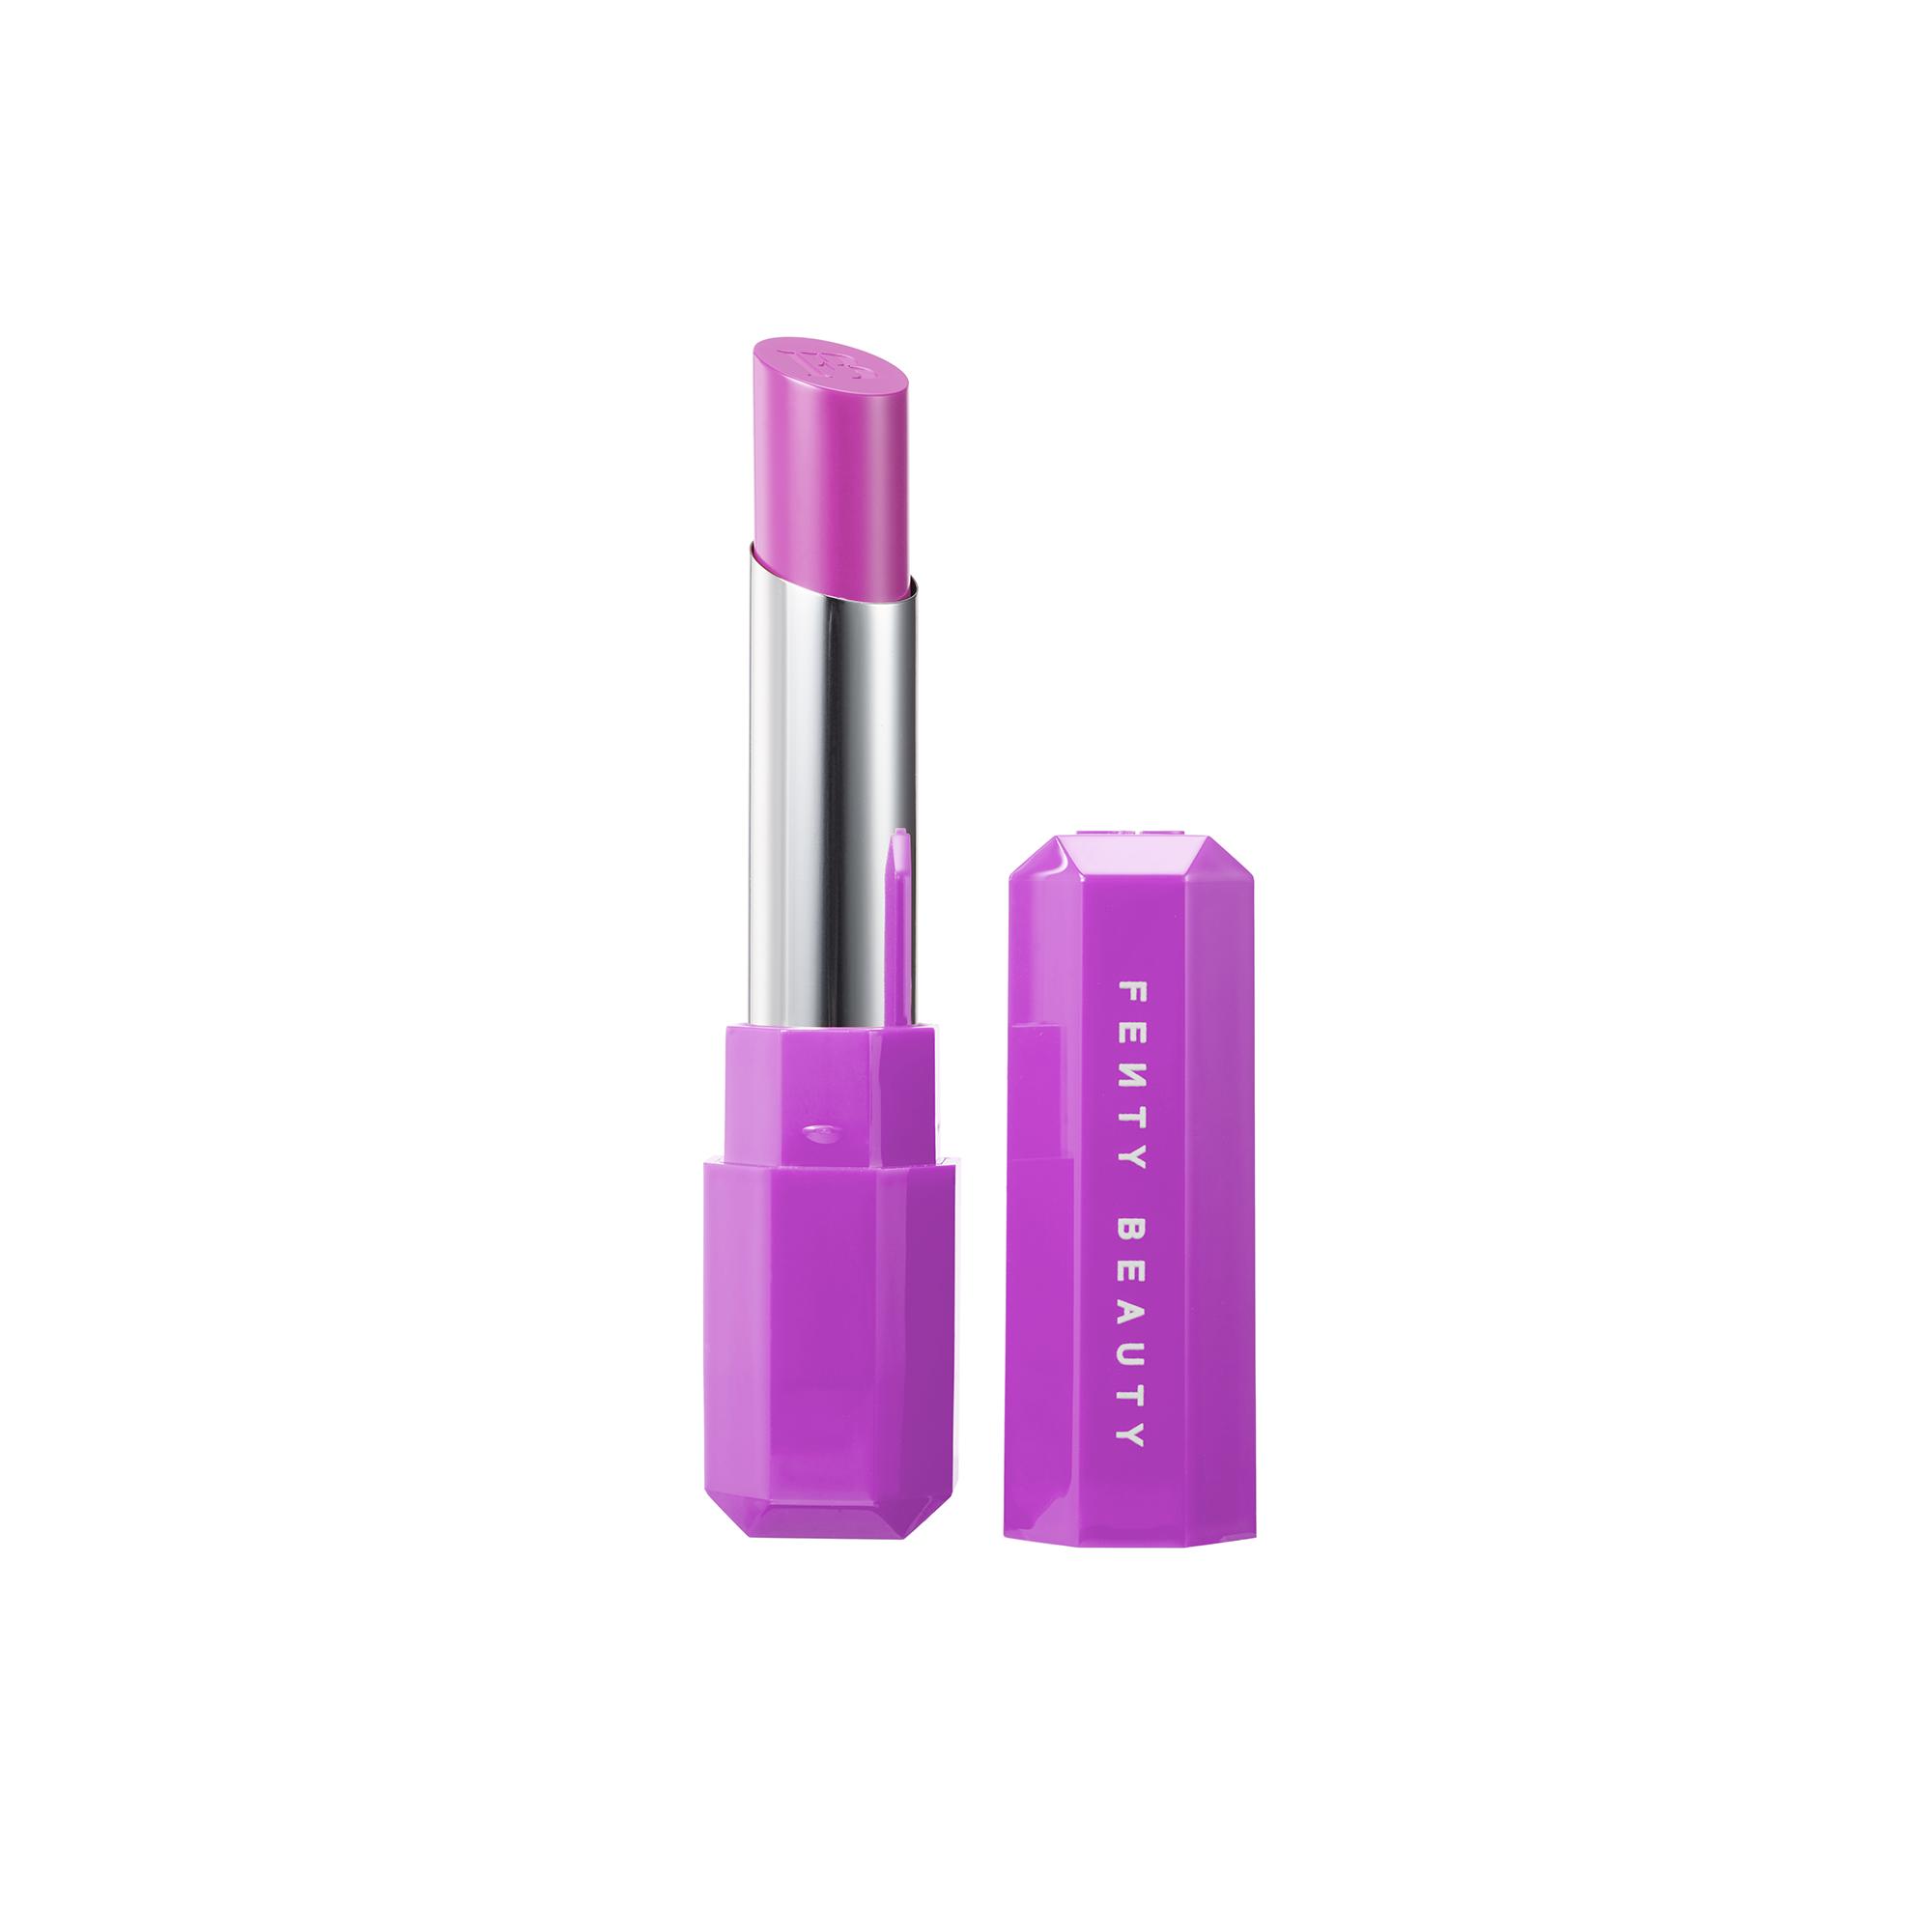 Poutsicle Juicy Satin Lipstick in Alpha Doll, $32